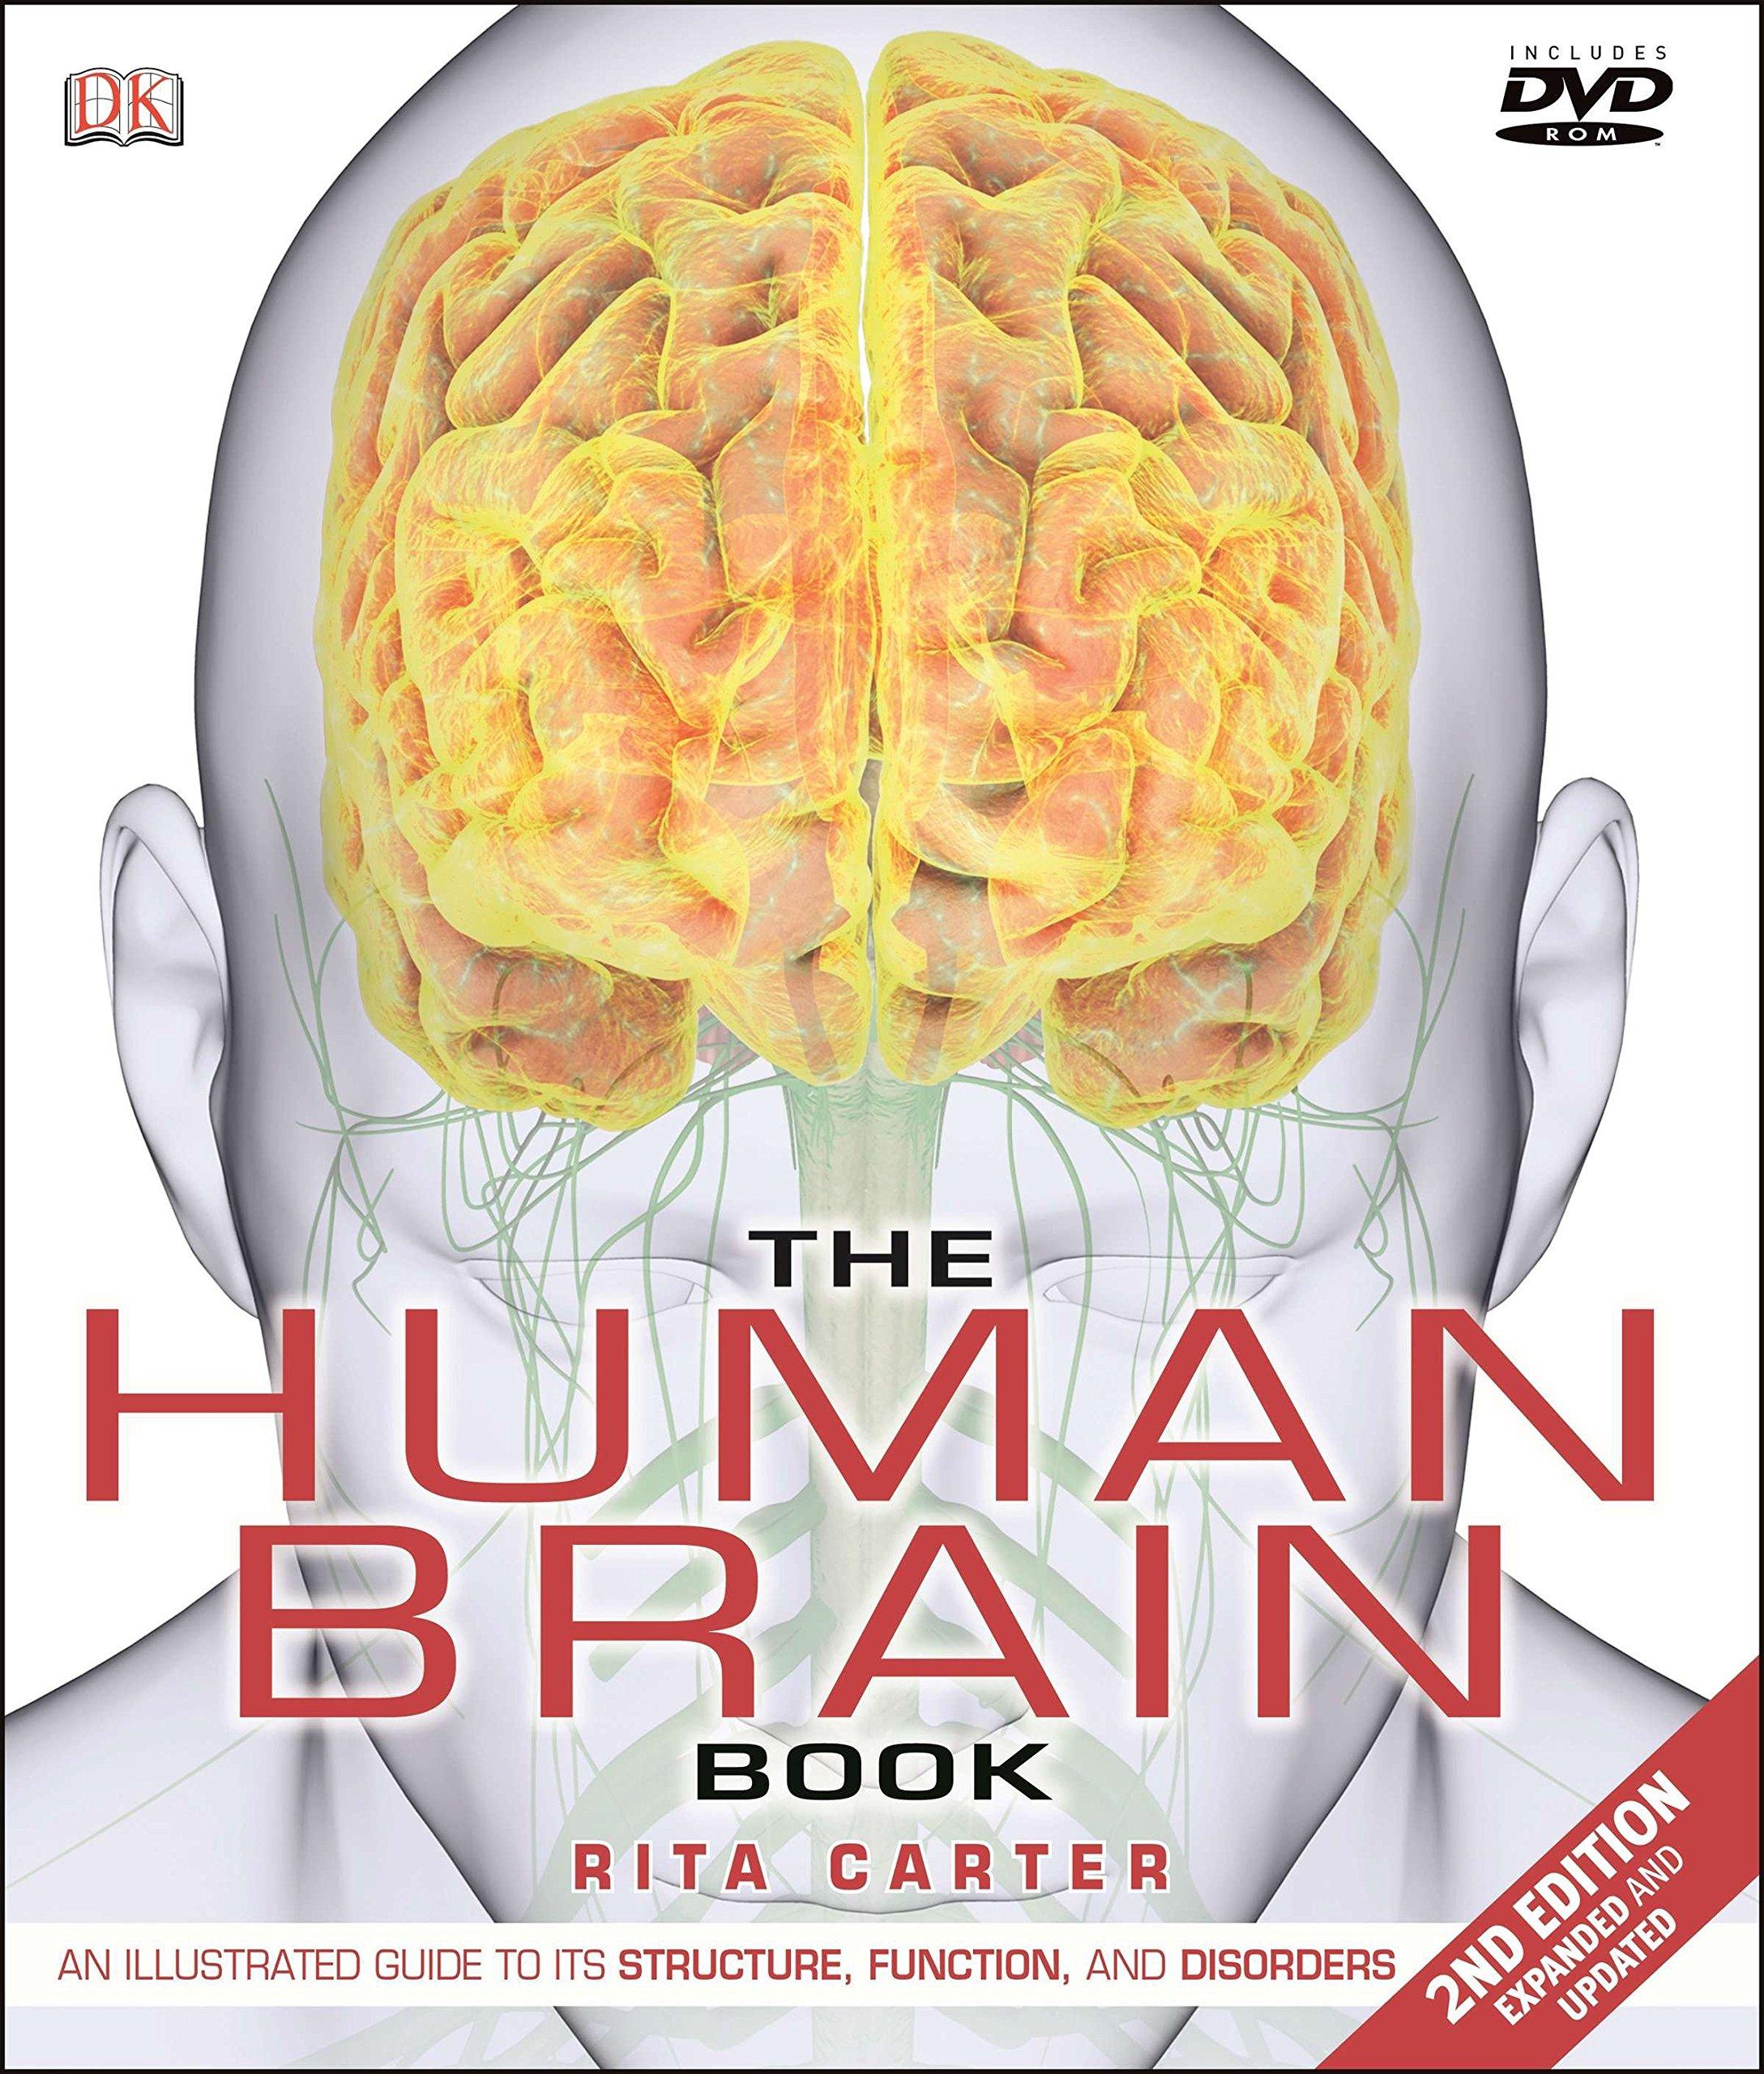 The Human Brain Book: Rita Carter: 9781465416025: Books - Amazon.ca